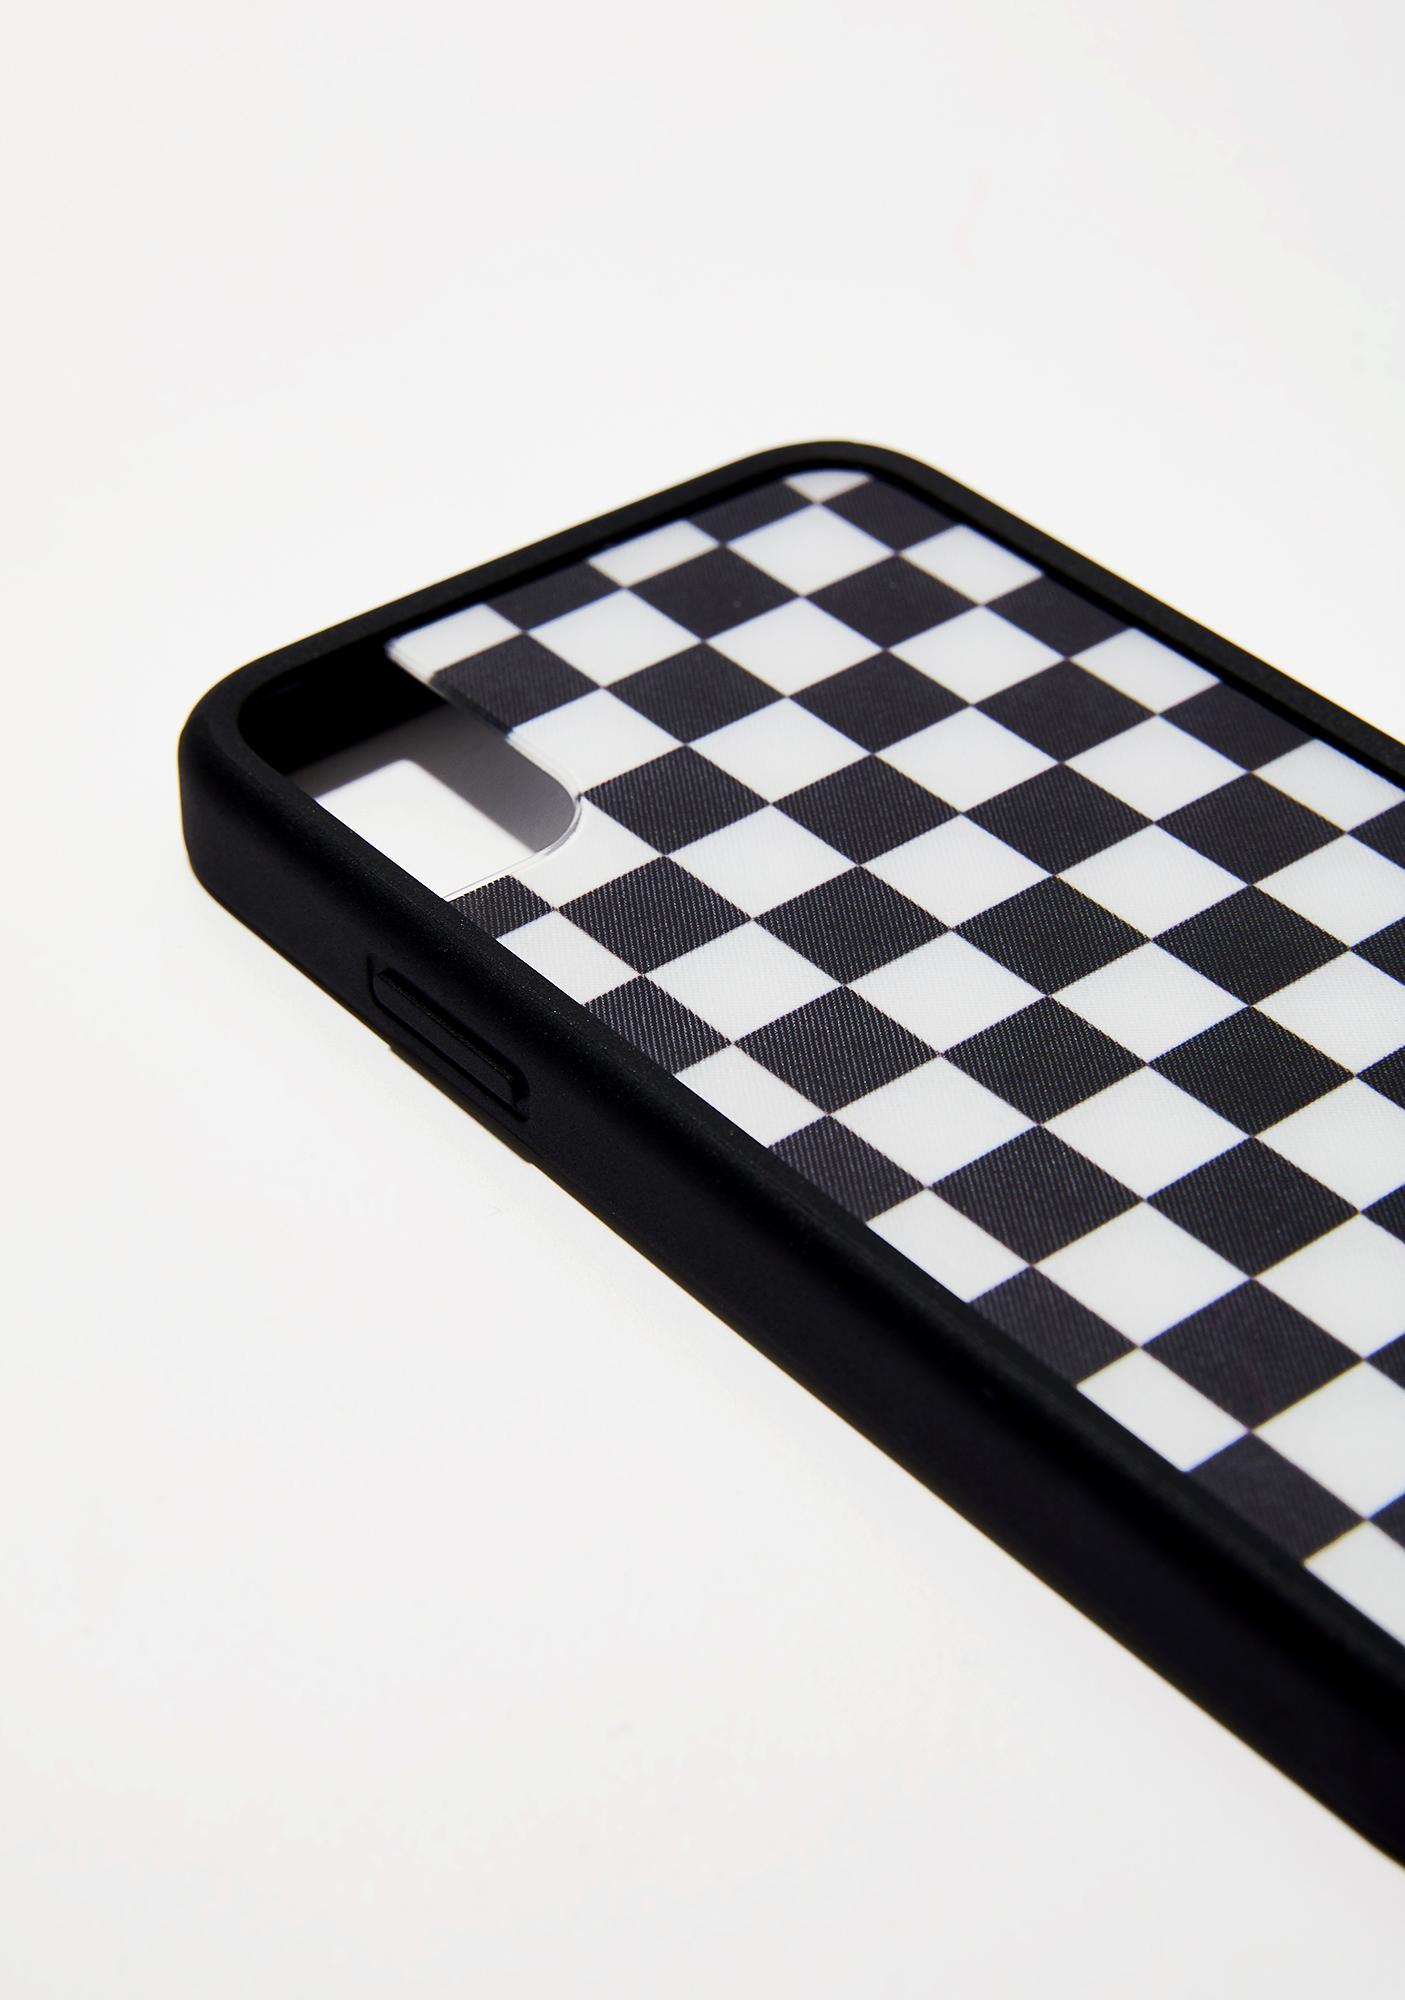 Wildflower Checkered IPhone X Case